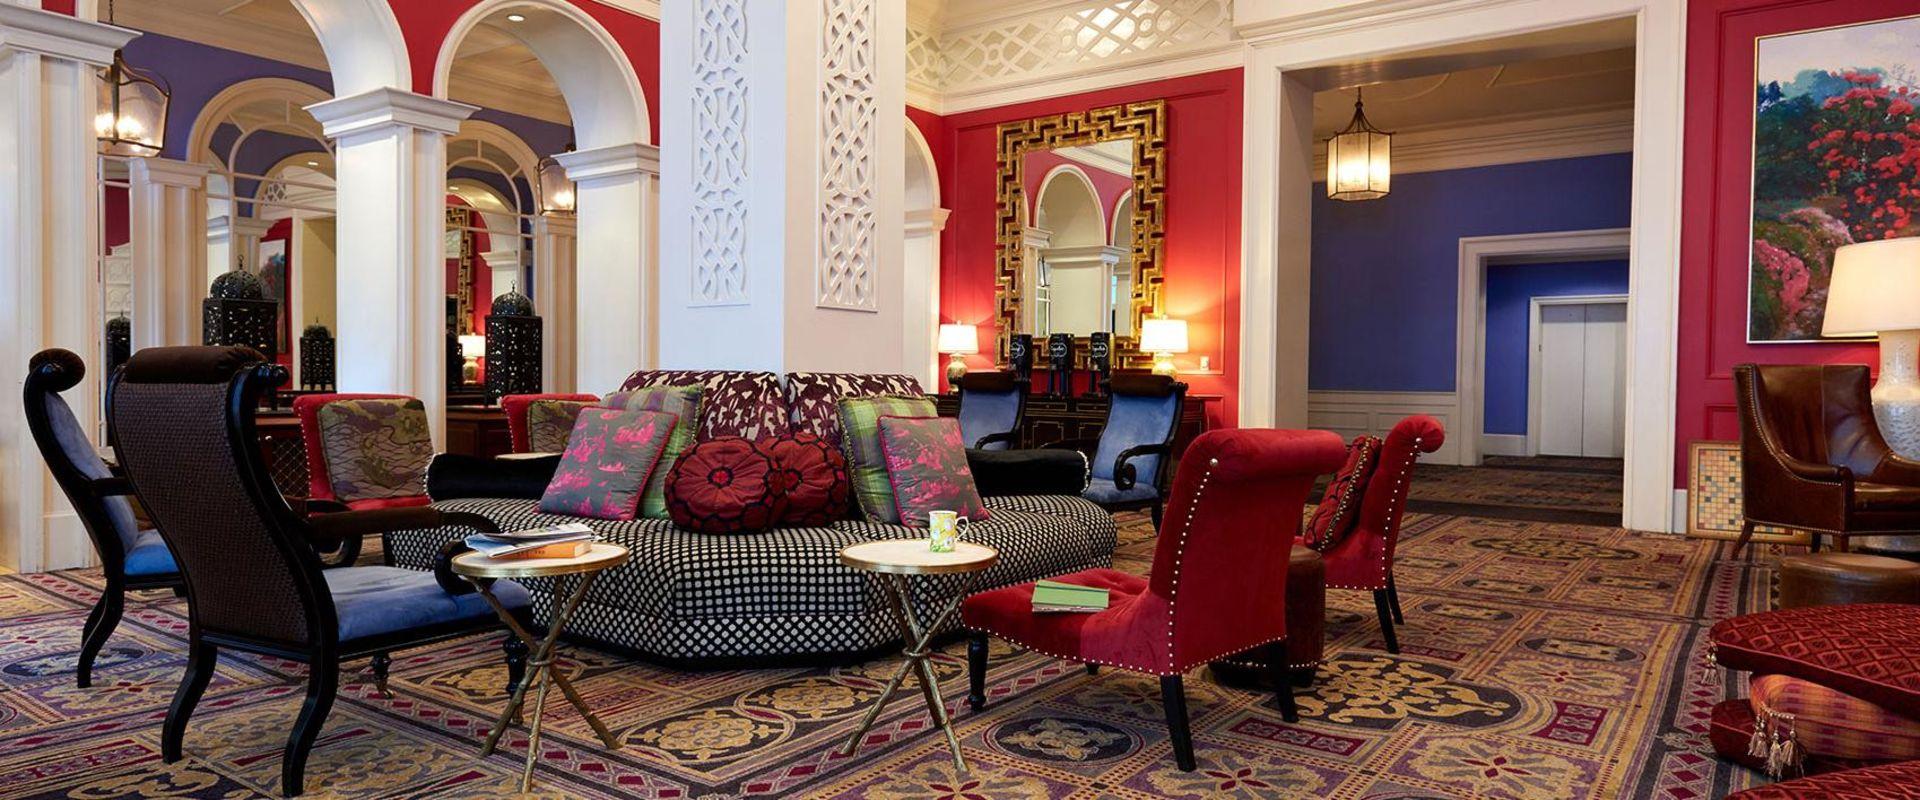 Downtown Portland Hotel Lobby Conversation Area